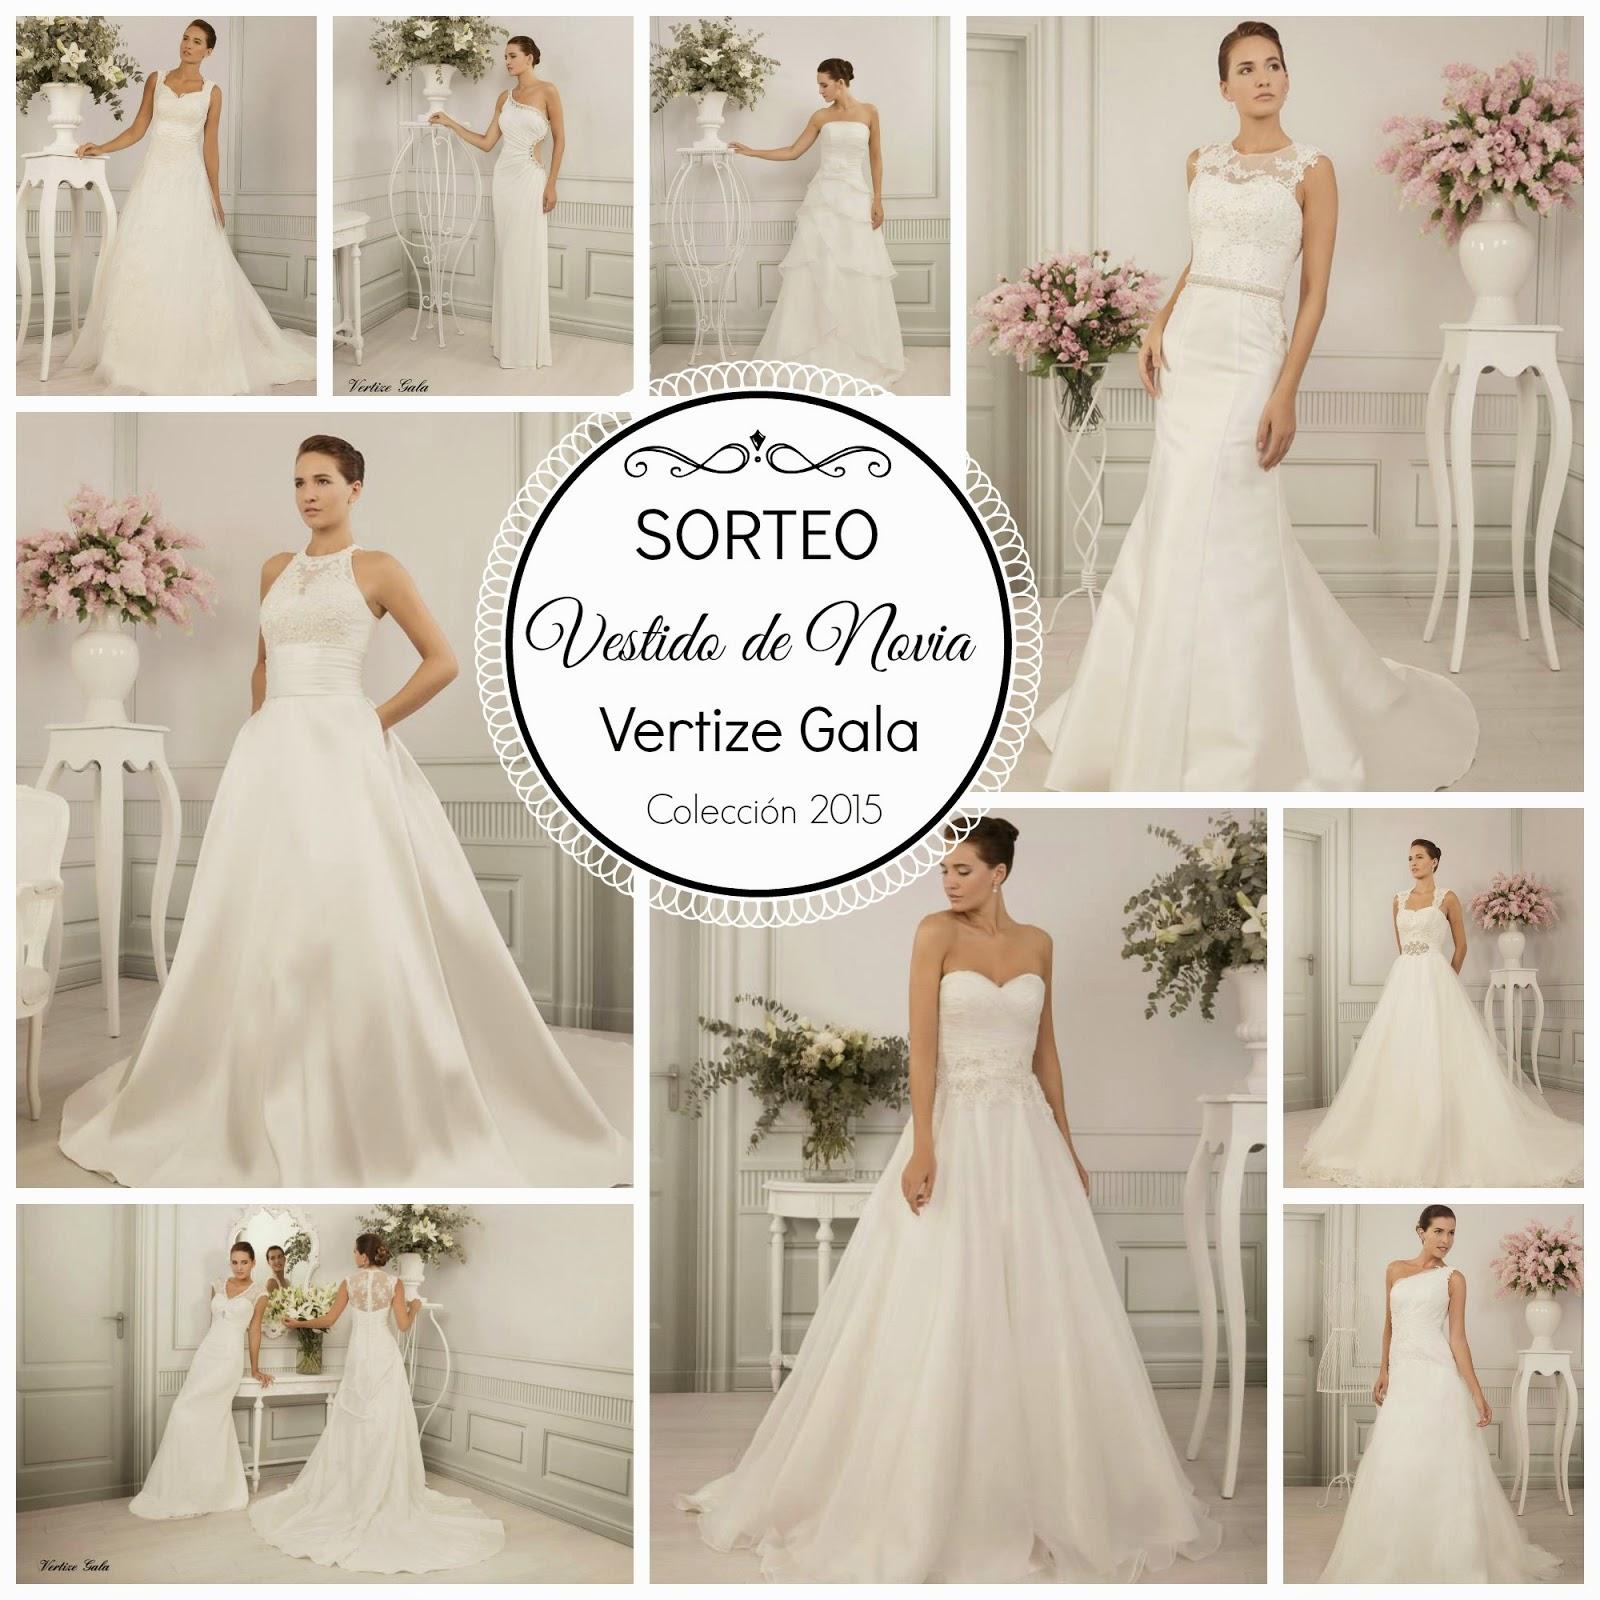 sorteo vestido de novia coleccion 2015 vertize gala blog bodas mi boda gratis